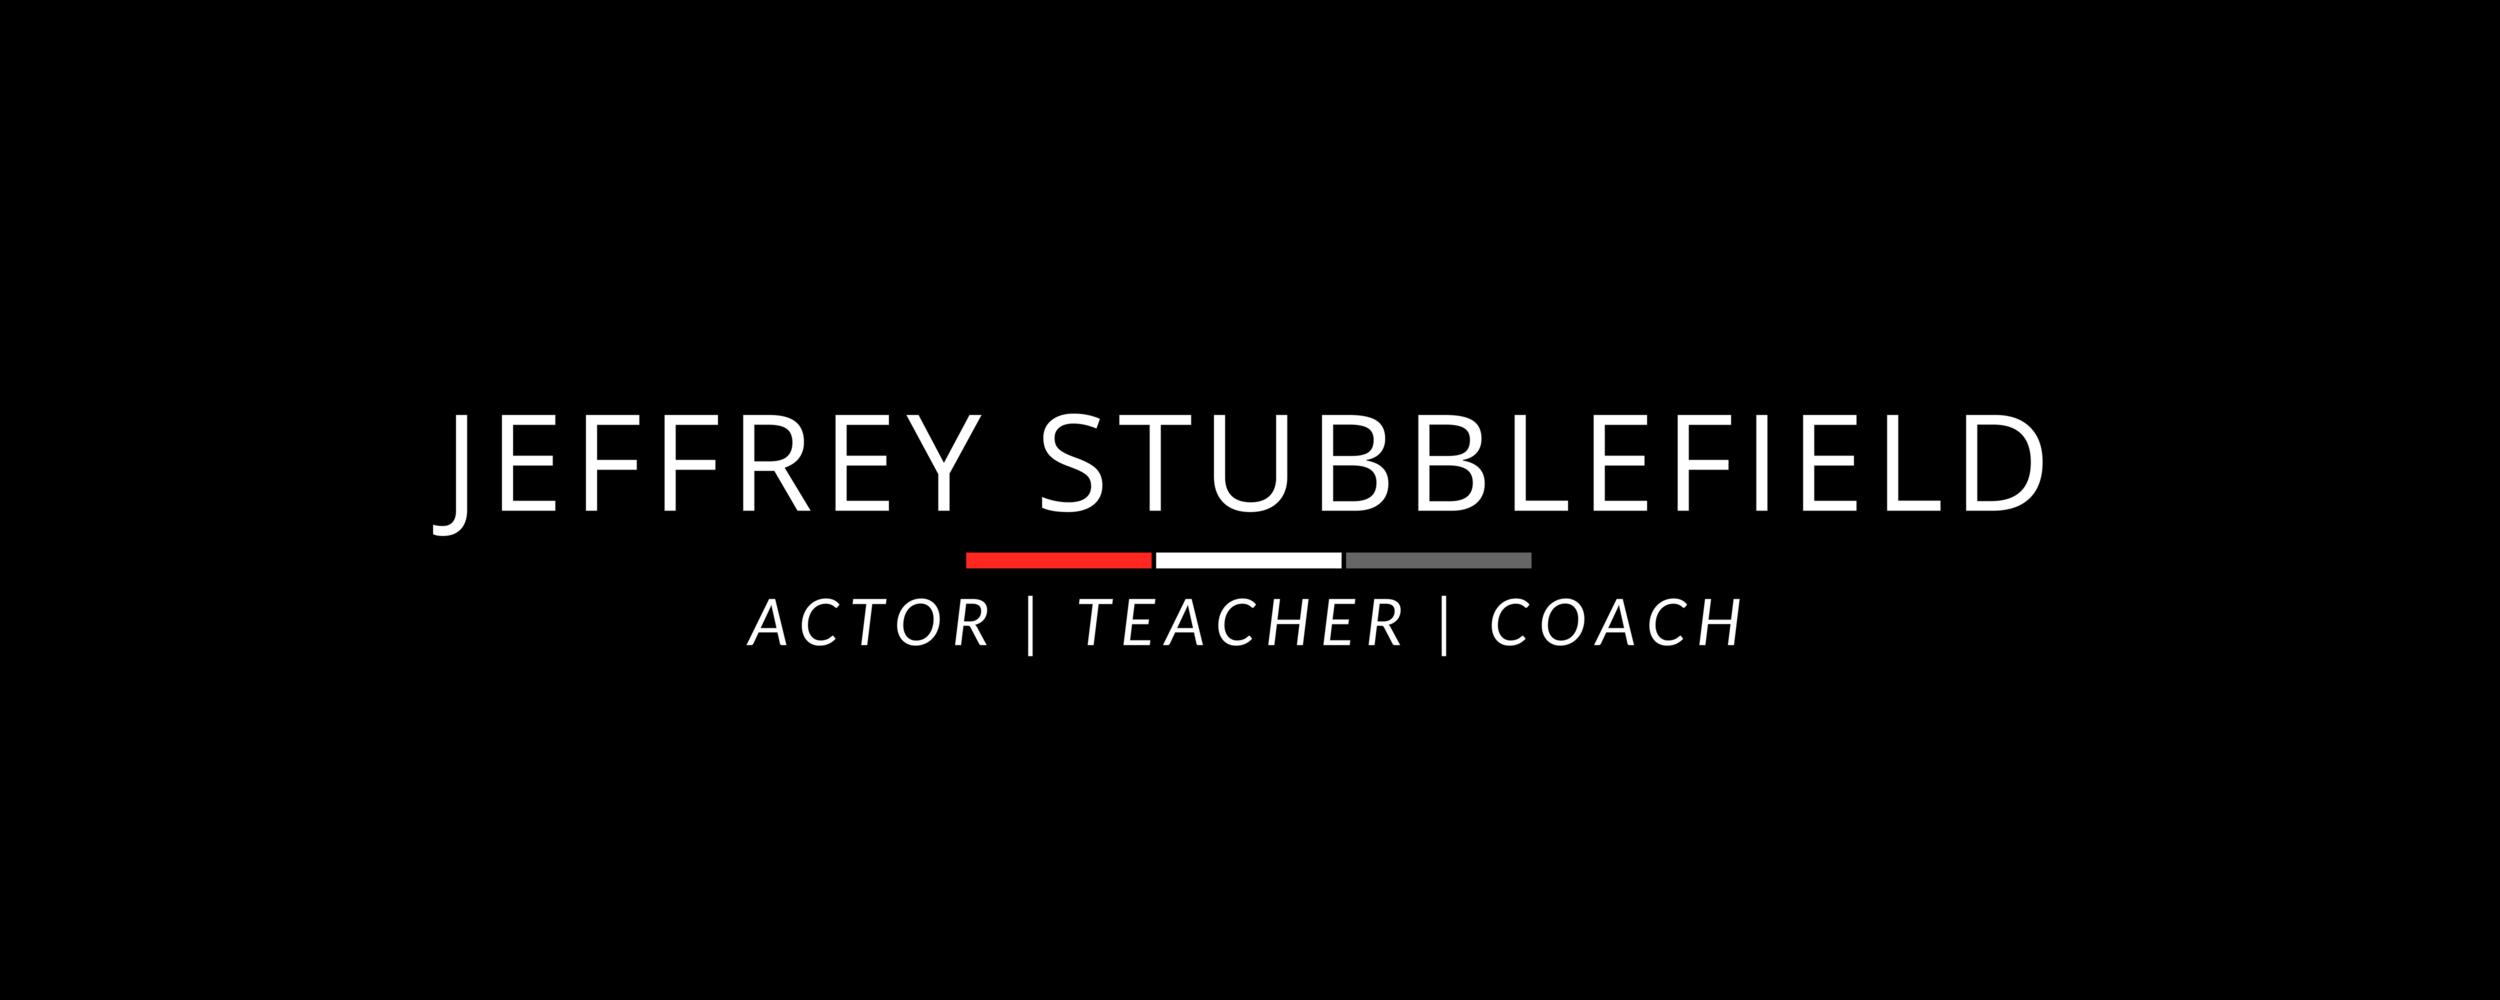 Copy of Jeffrey Stubblefield